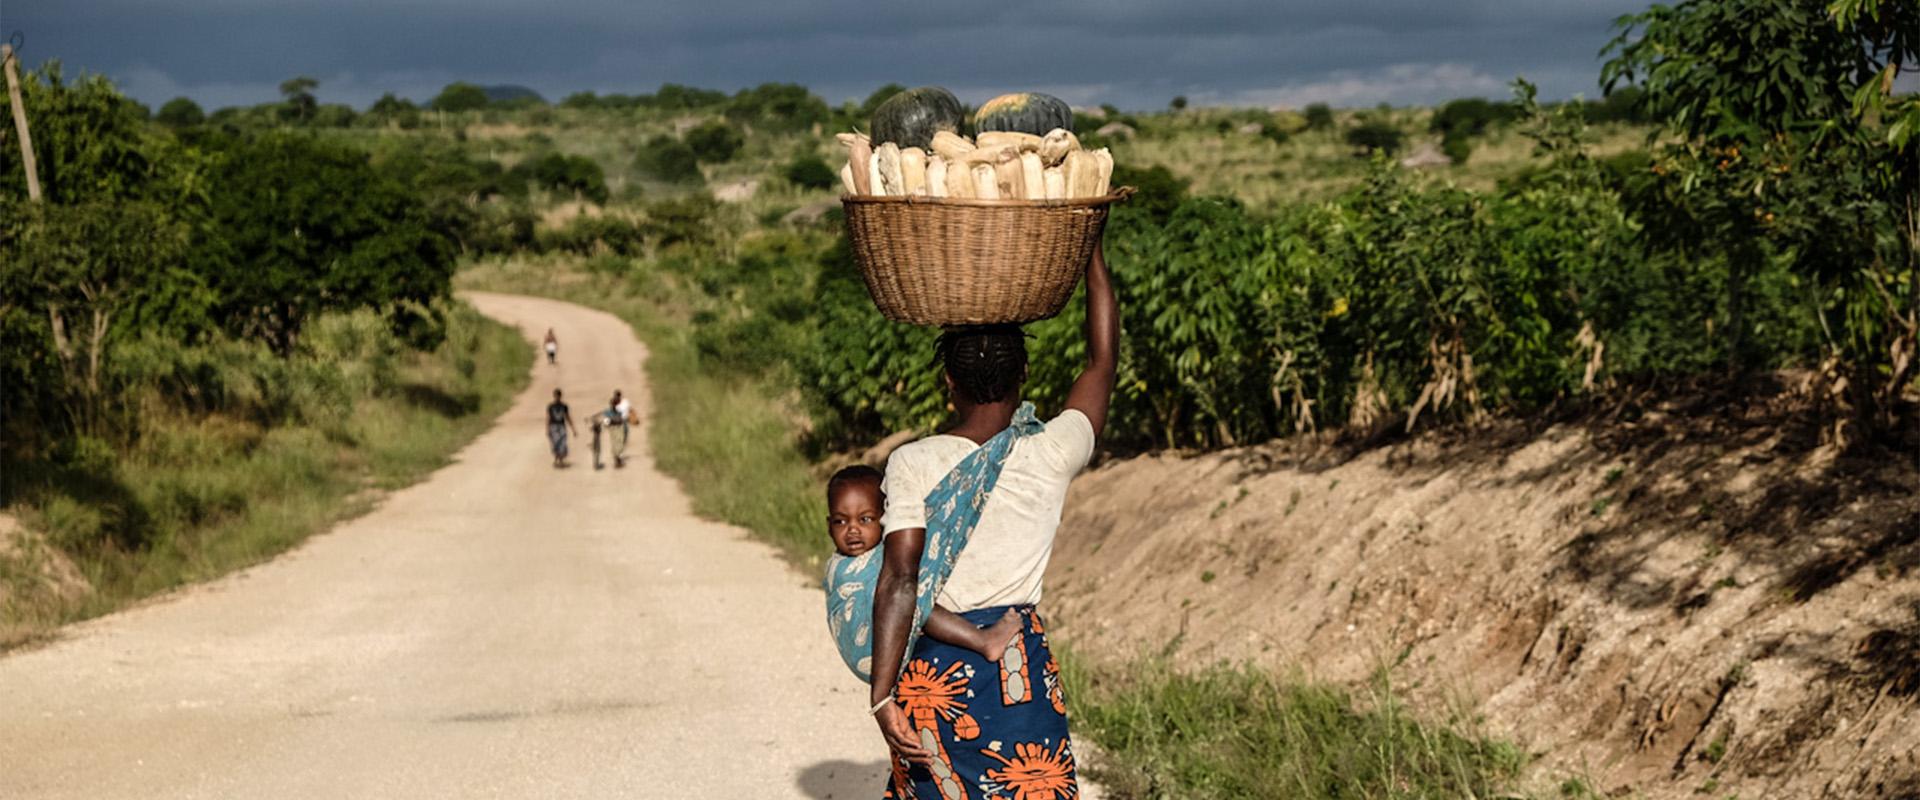 agricoltura donna strada Mozambico Mani Tese 2018